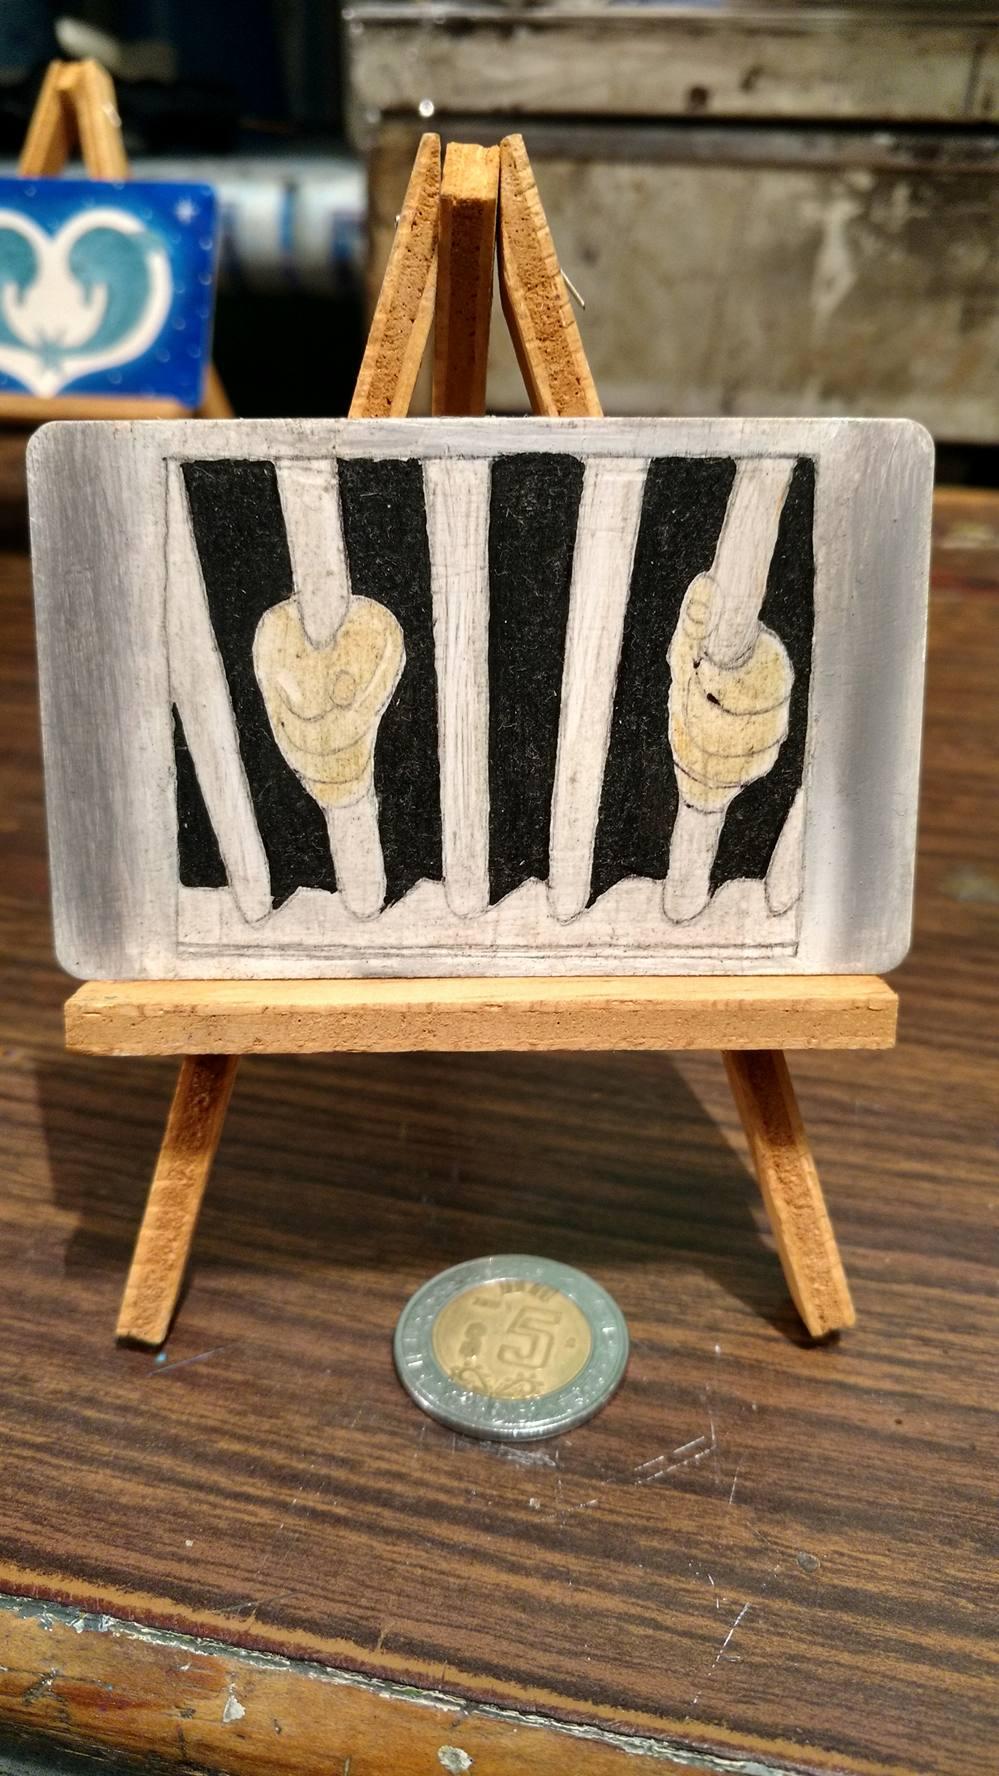 cimarron-collective-prison-art-3